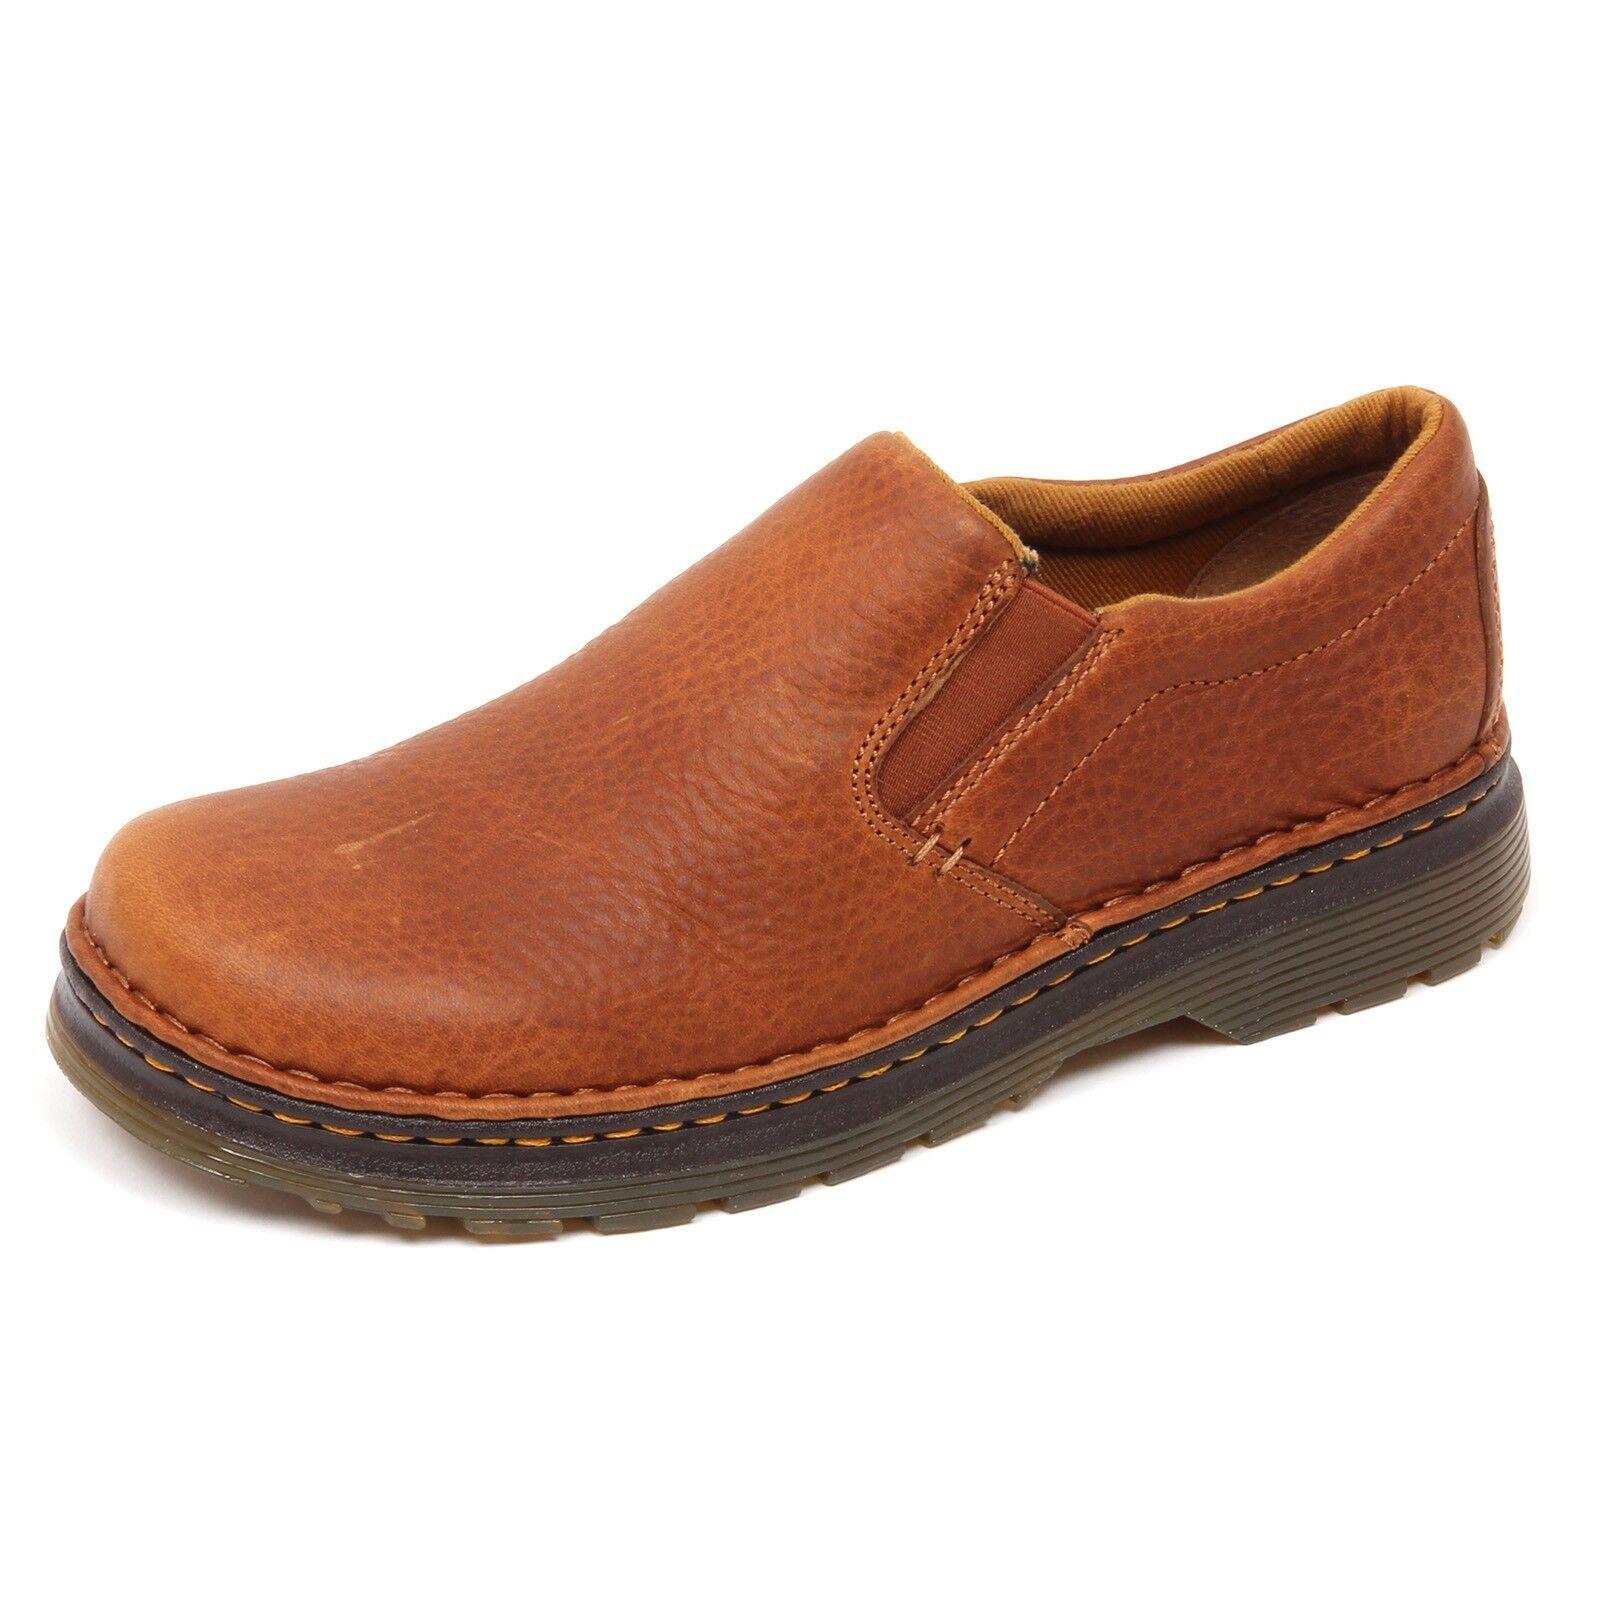 D3186 (without box) scarpa uomo DR. MARTENS cuoio cuoio cuoio vintage slip on scarpe man | Buon design  66438f